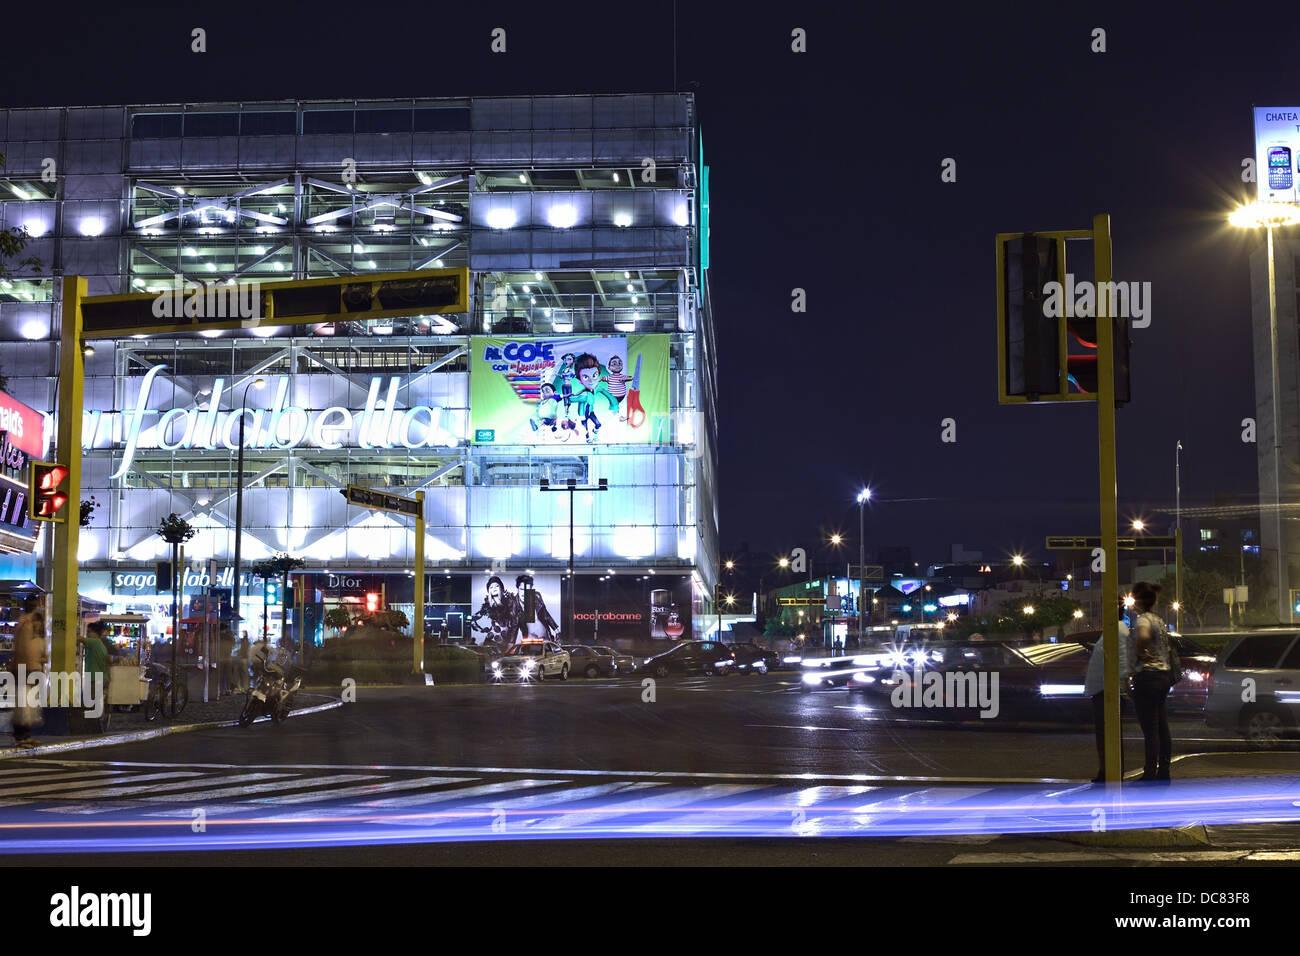 Saga Falabella department store at Ovalo Miraflores in the district of Miraflores, Lima, Peru at Night - Stock Image